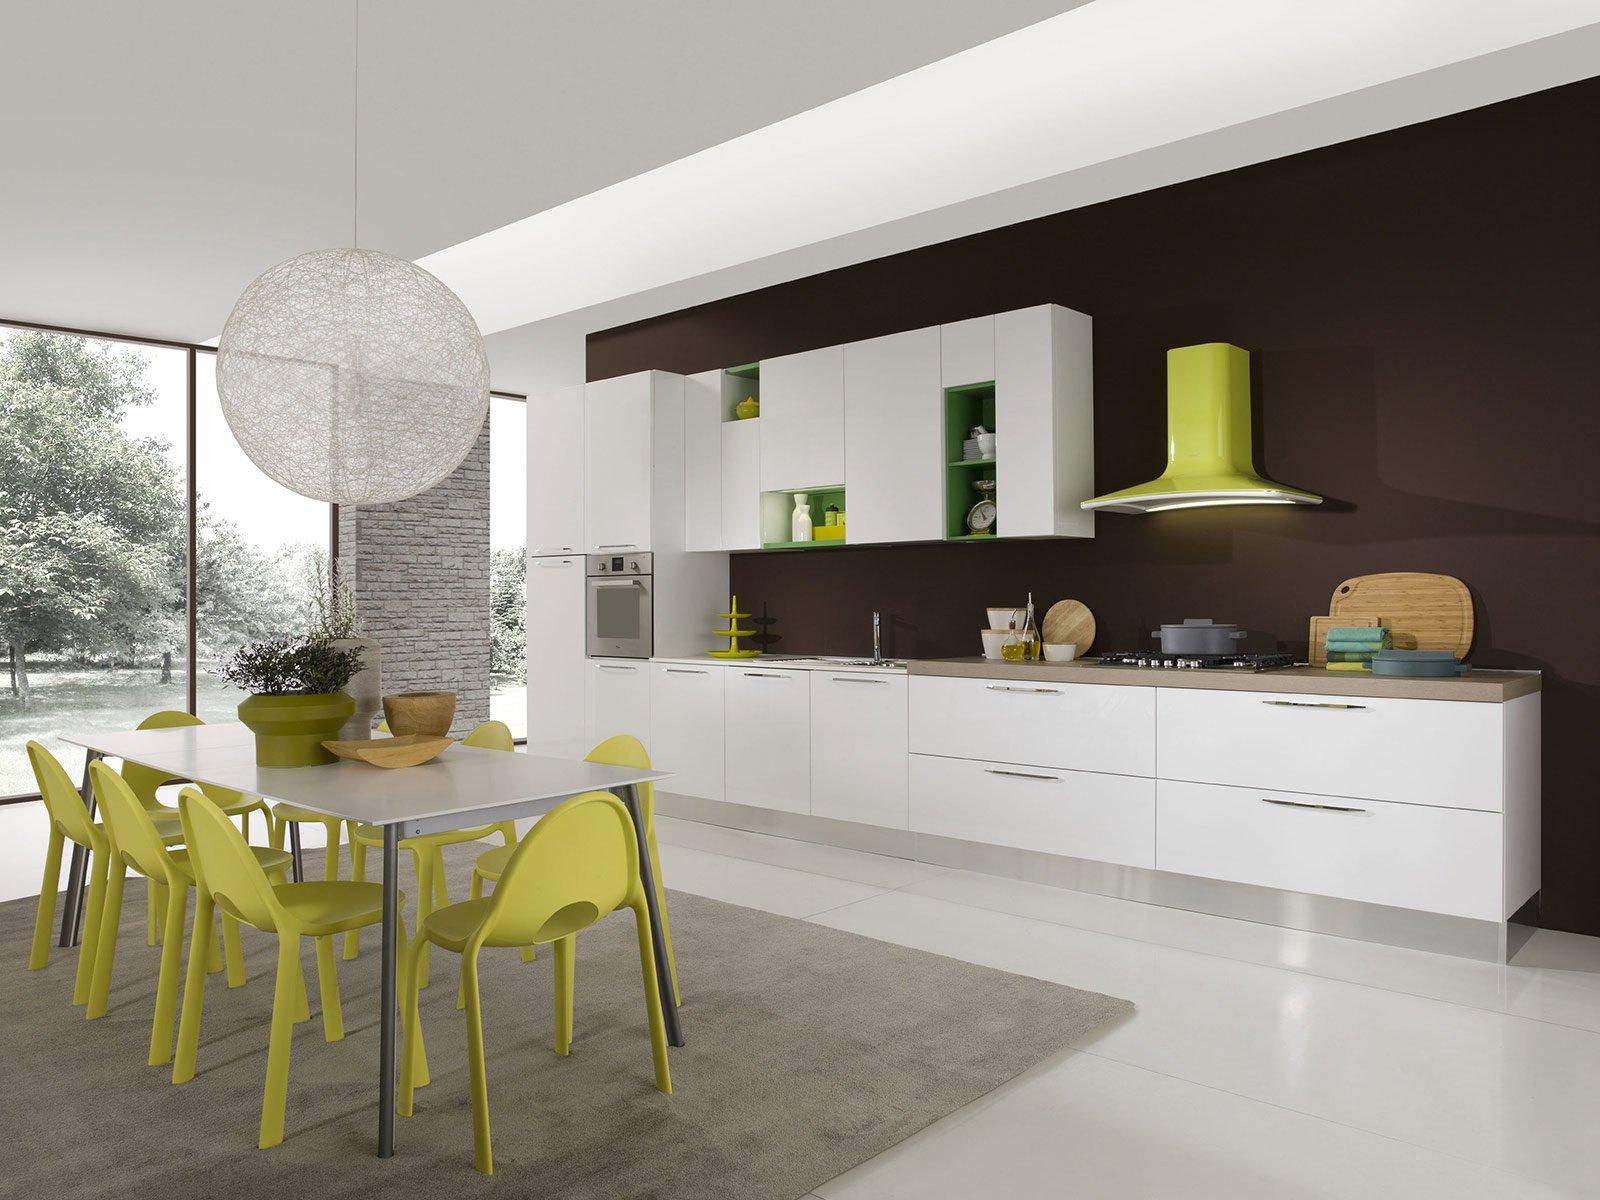 Cucine bianche moderne cose di casa for Piani di casa aperti con grandi cucine